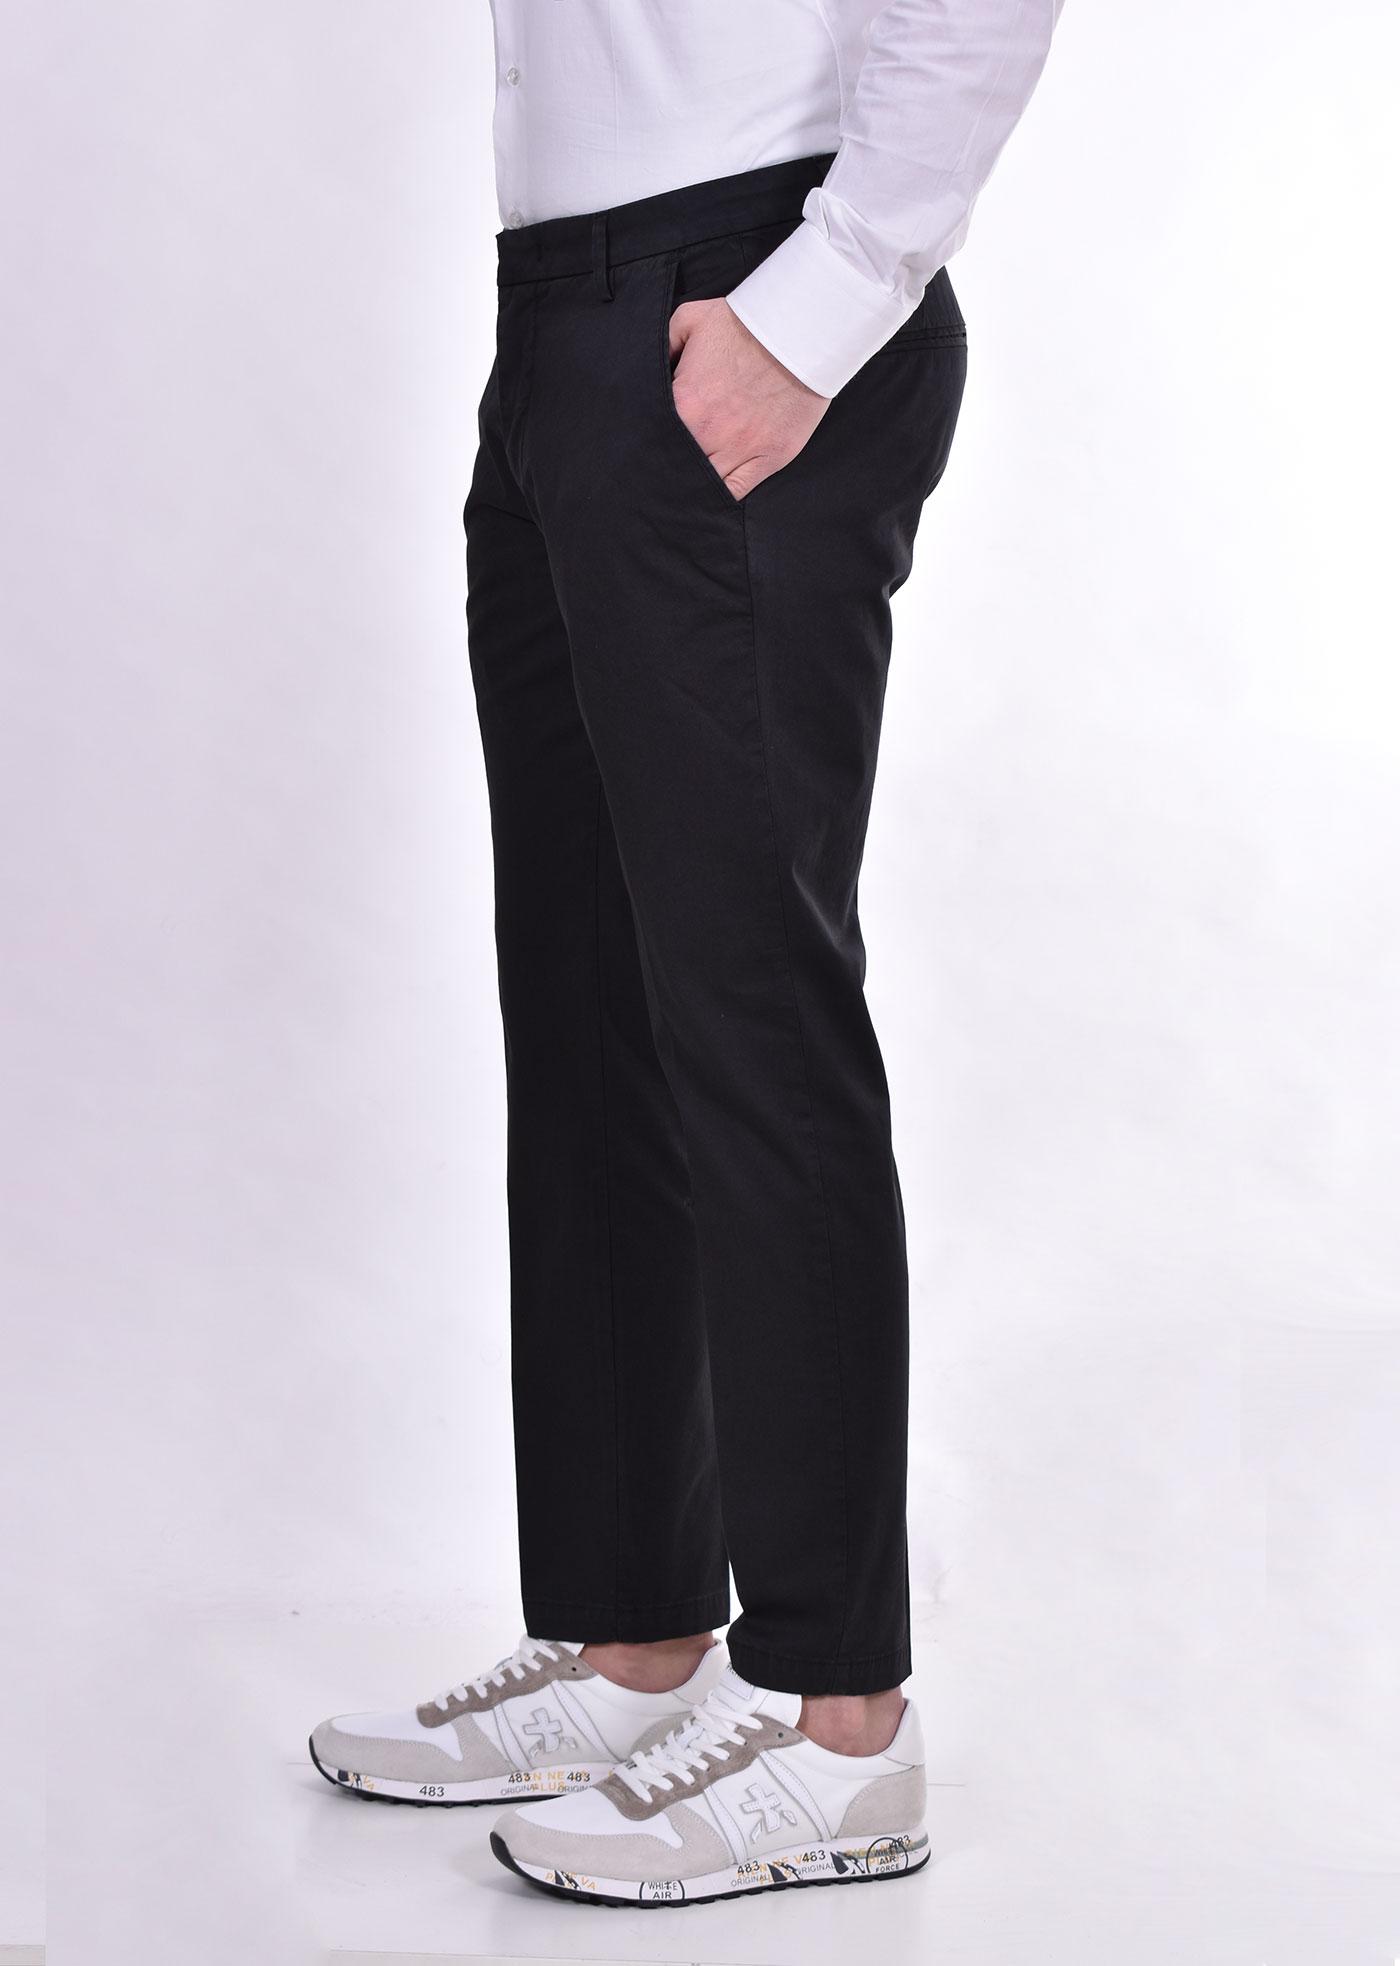 Bro Ship campri miami black trousers BRO SHIP   BSMIA8221019